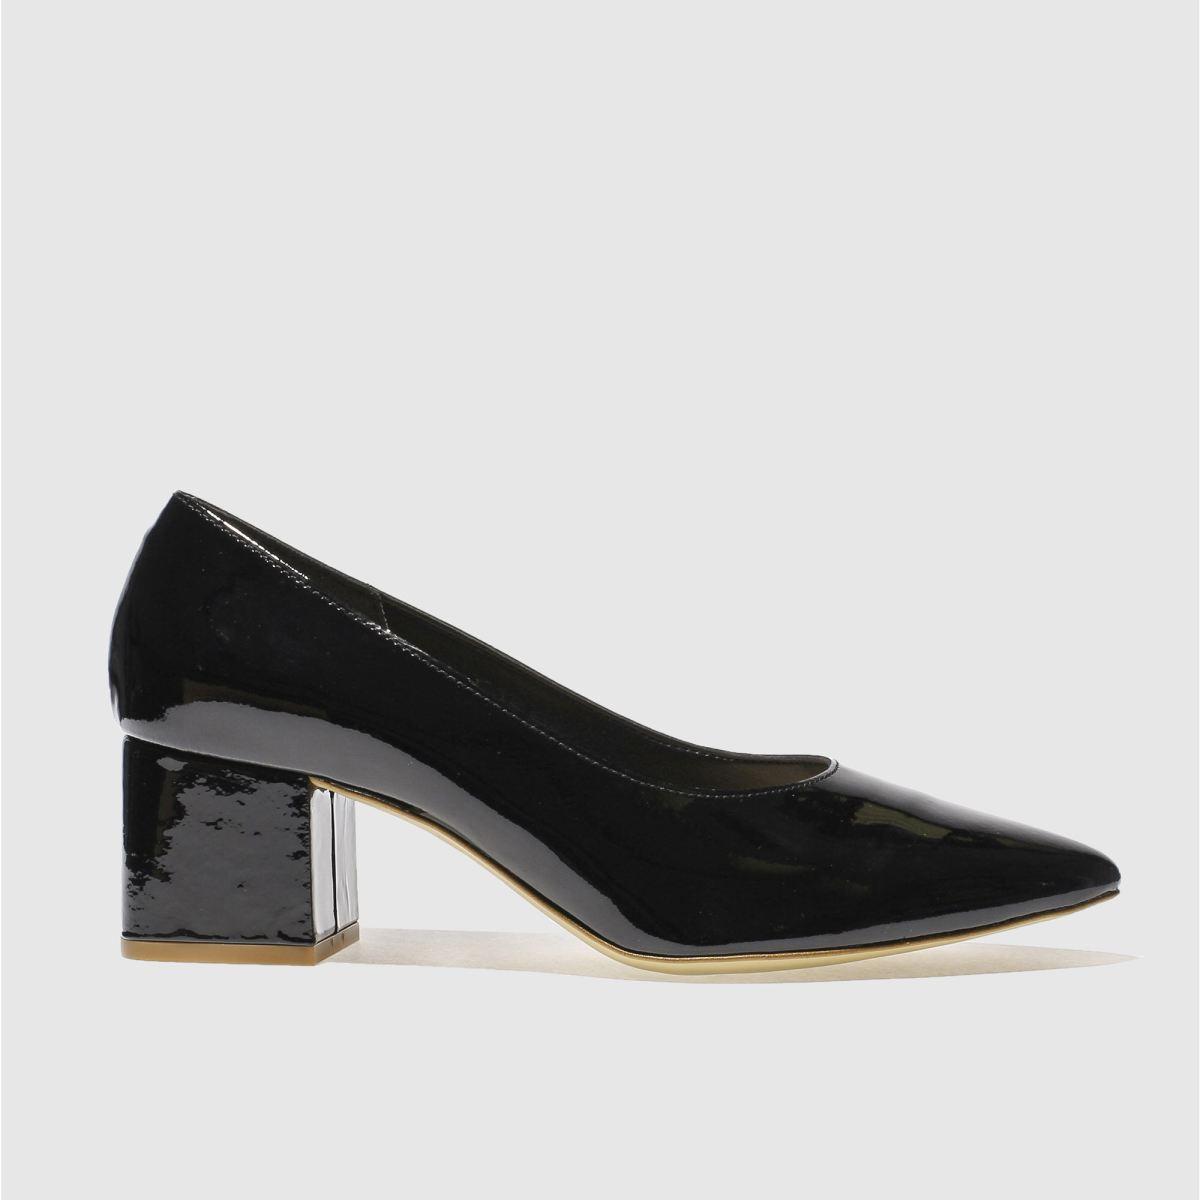 Schuh Black Shimmy Low Heels